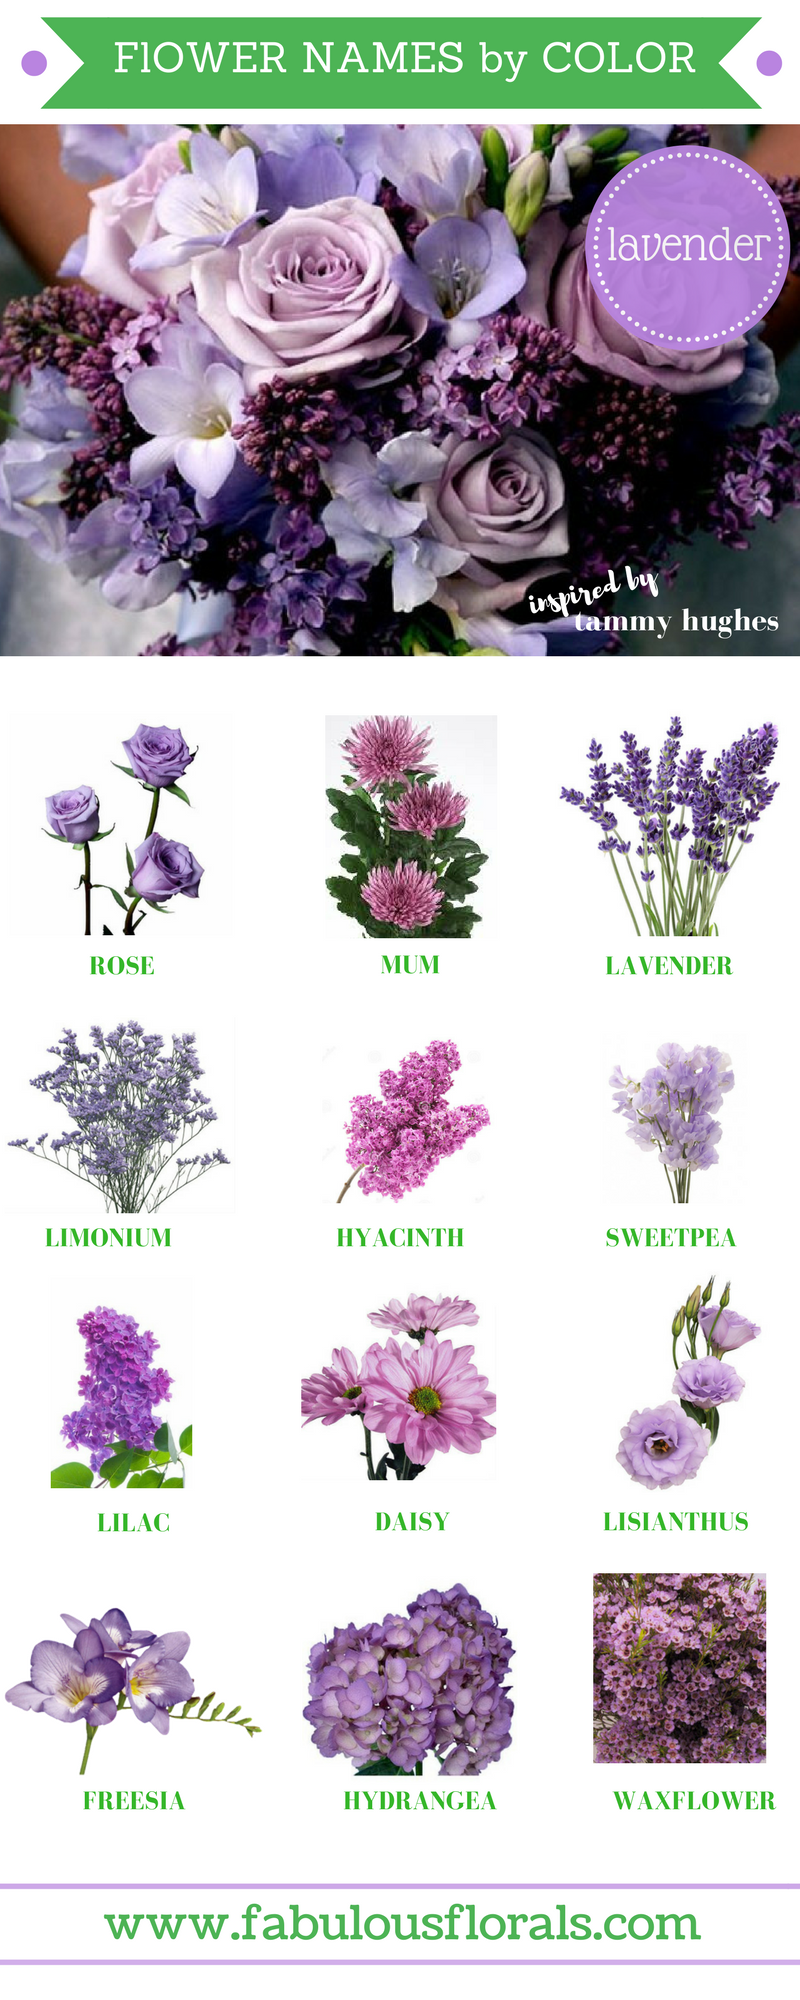 10 Mesmerizing Your Wedding Flowers Ideas Wedding Flower Trends Purple Wedding Flowers Diy Wedding Flowers